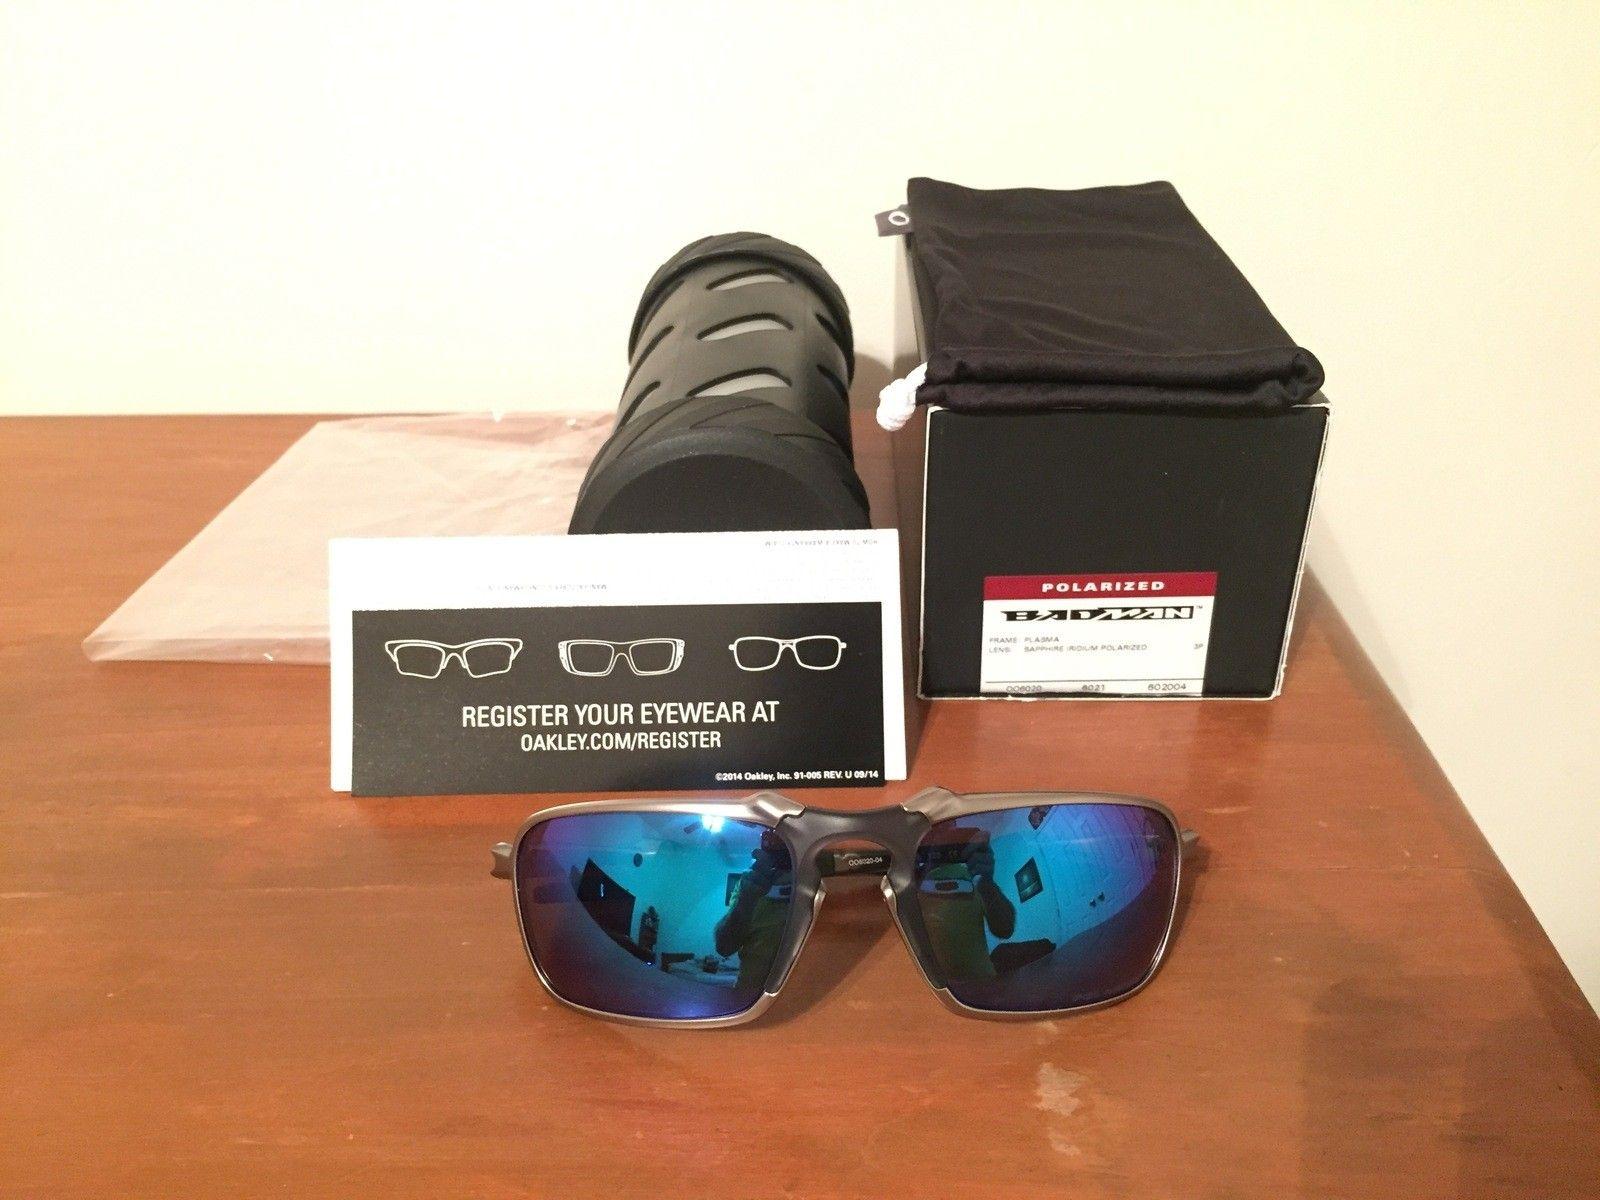 NEW Oakley Badman Sapphire Irid Polarized - IMG_6552.JPG